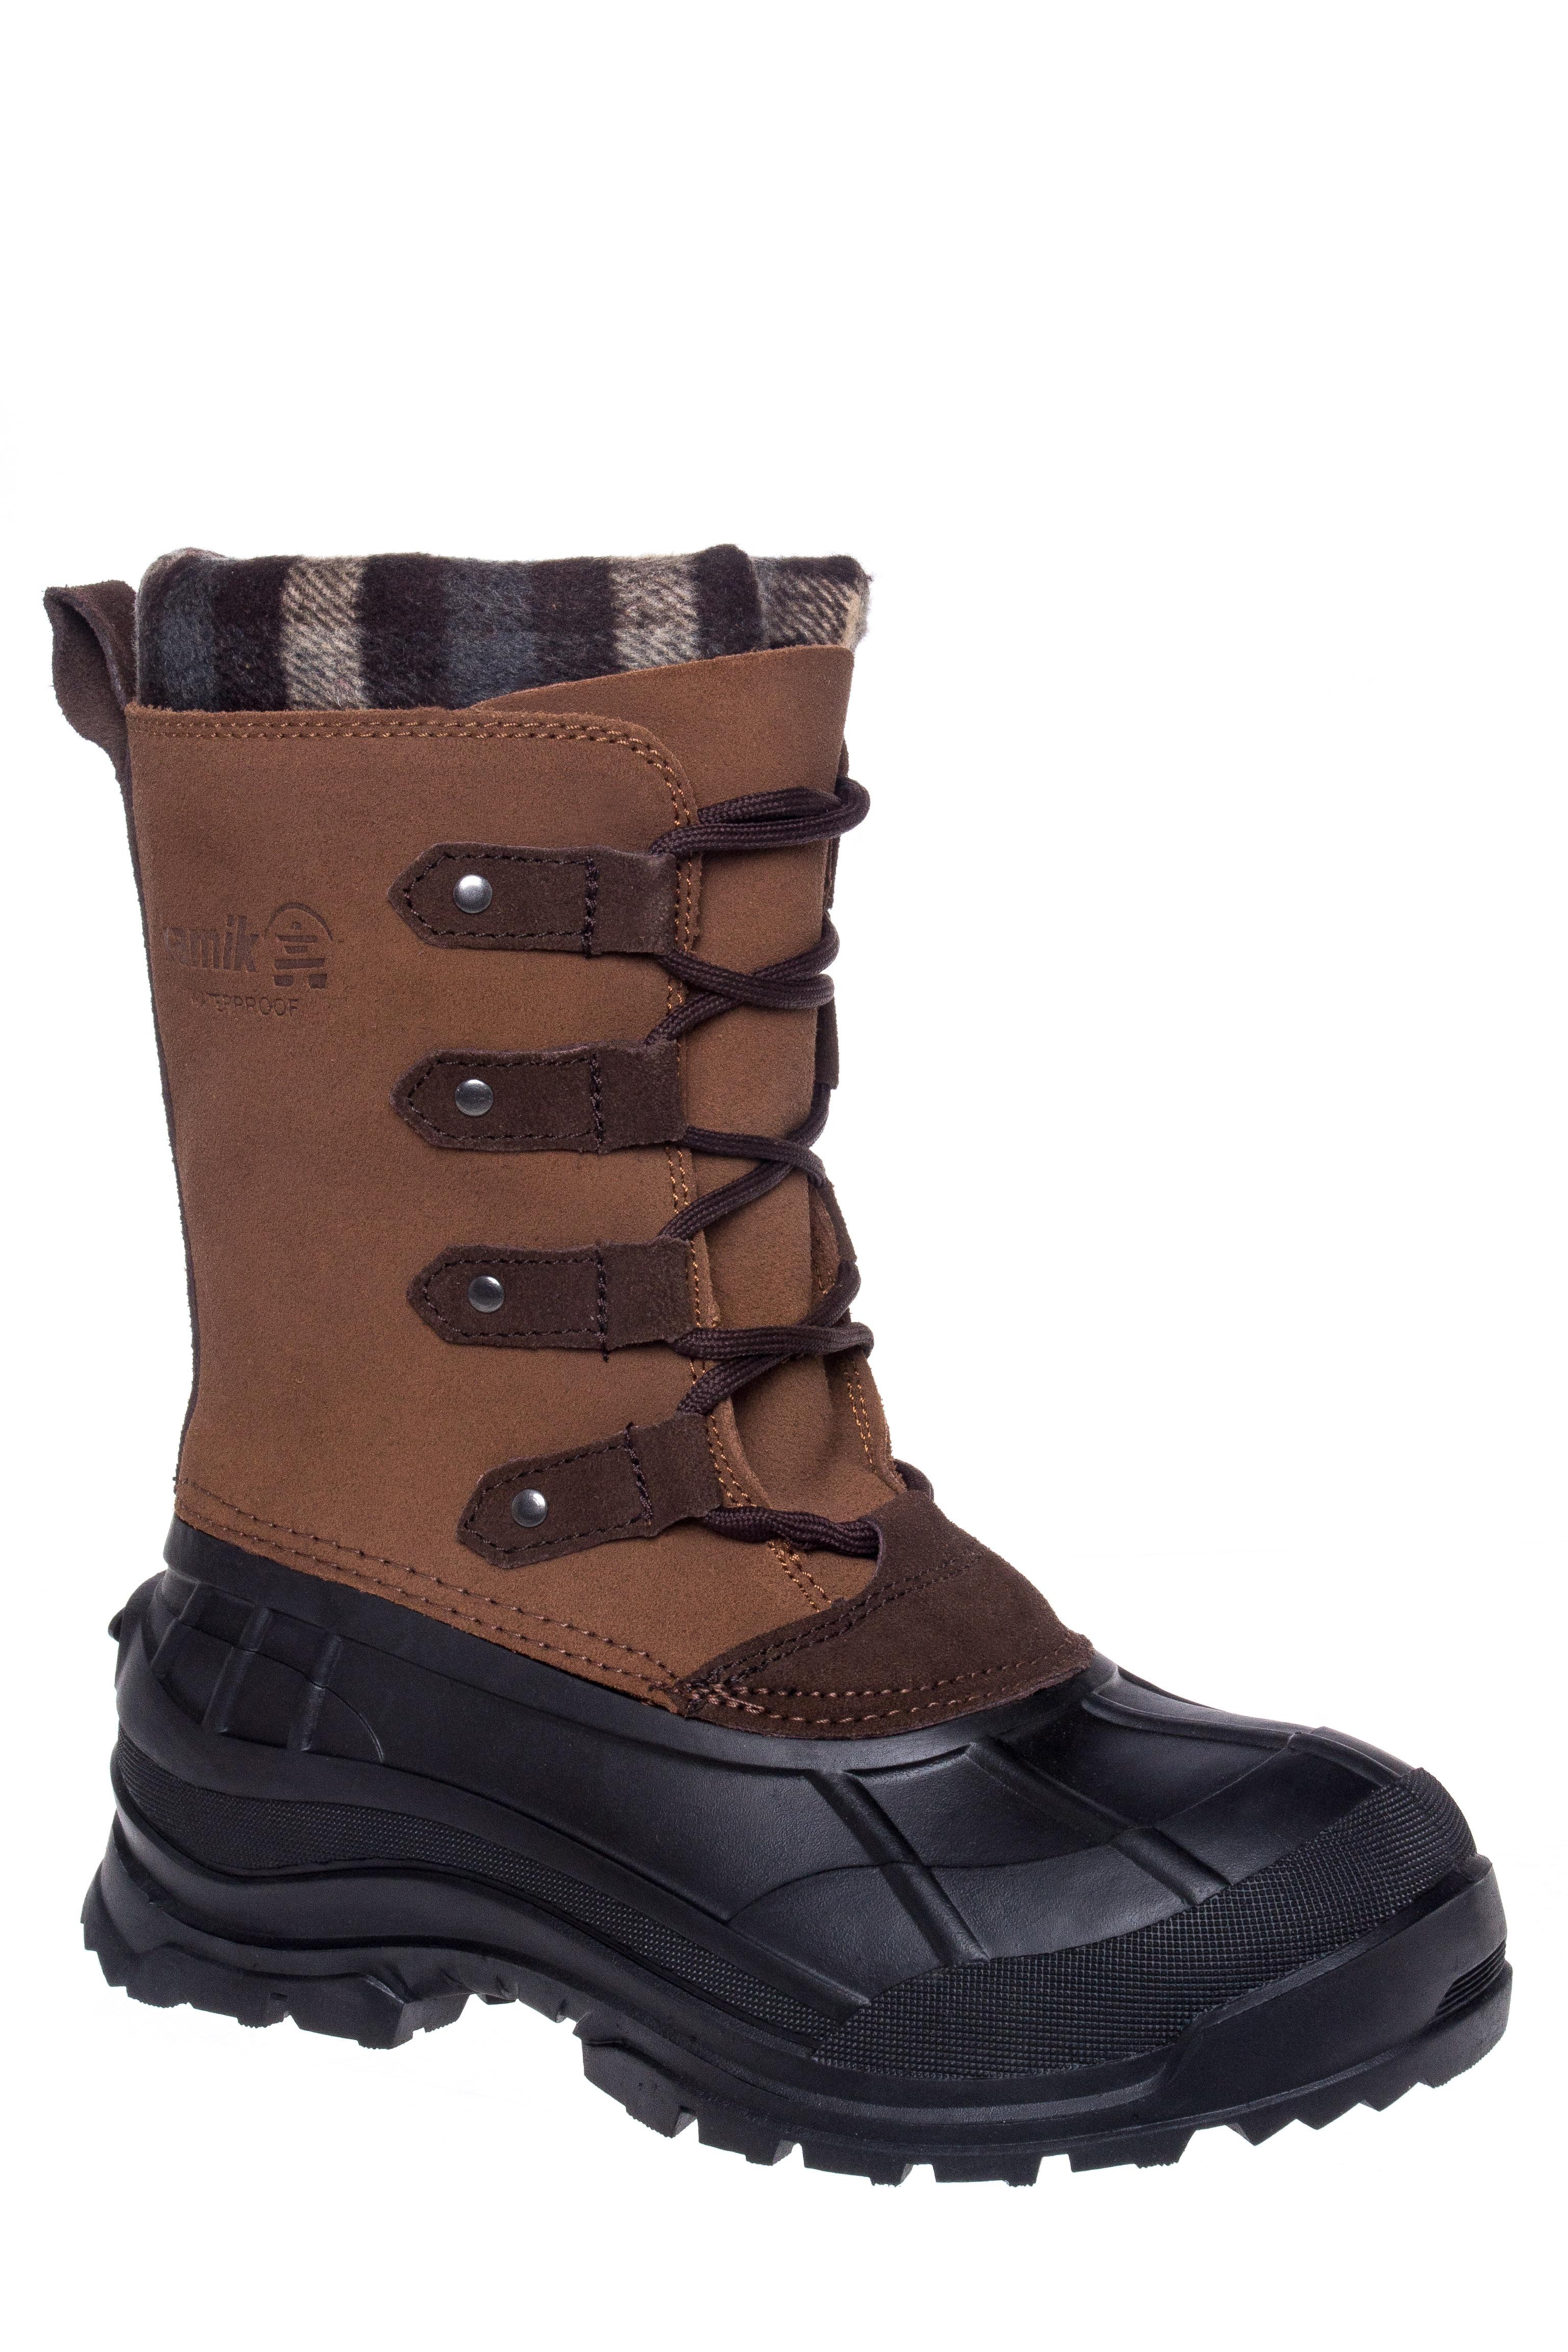 Kamik Calgary Lace-Up Waterproof Snow Boots - Tan